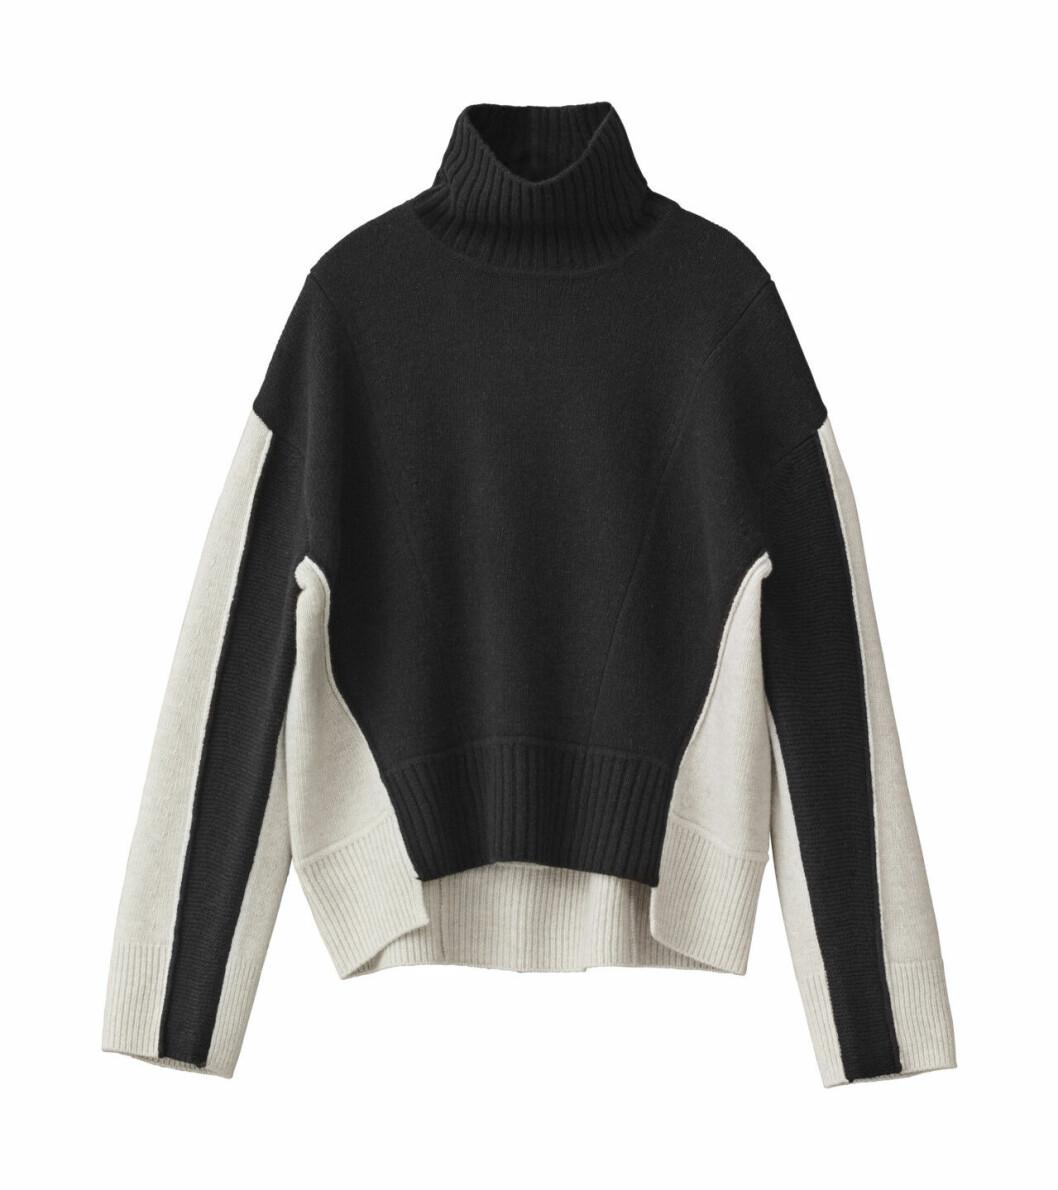 H&M Studio höstkollektion aw 2019 – svartvit stickad tröja